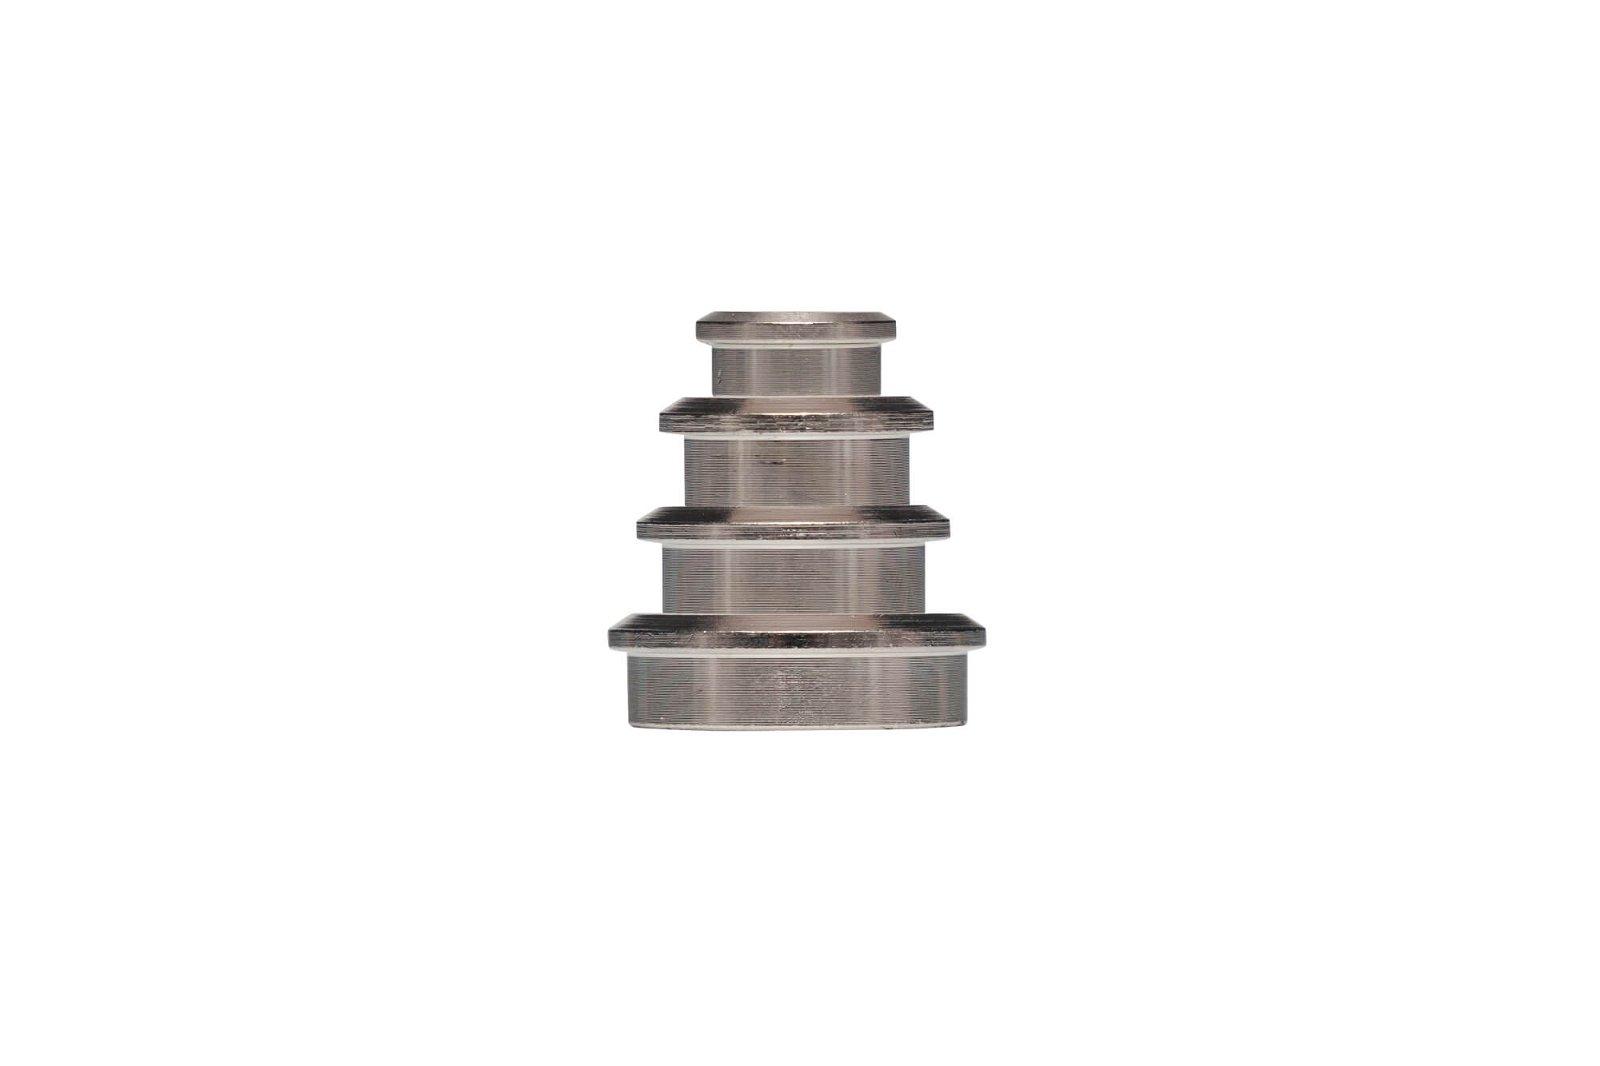 Neodym-Kraftmagnet, Ø 30 mm - 21 kg